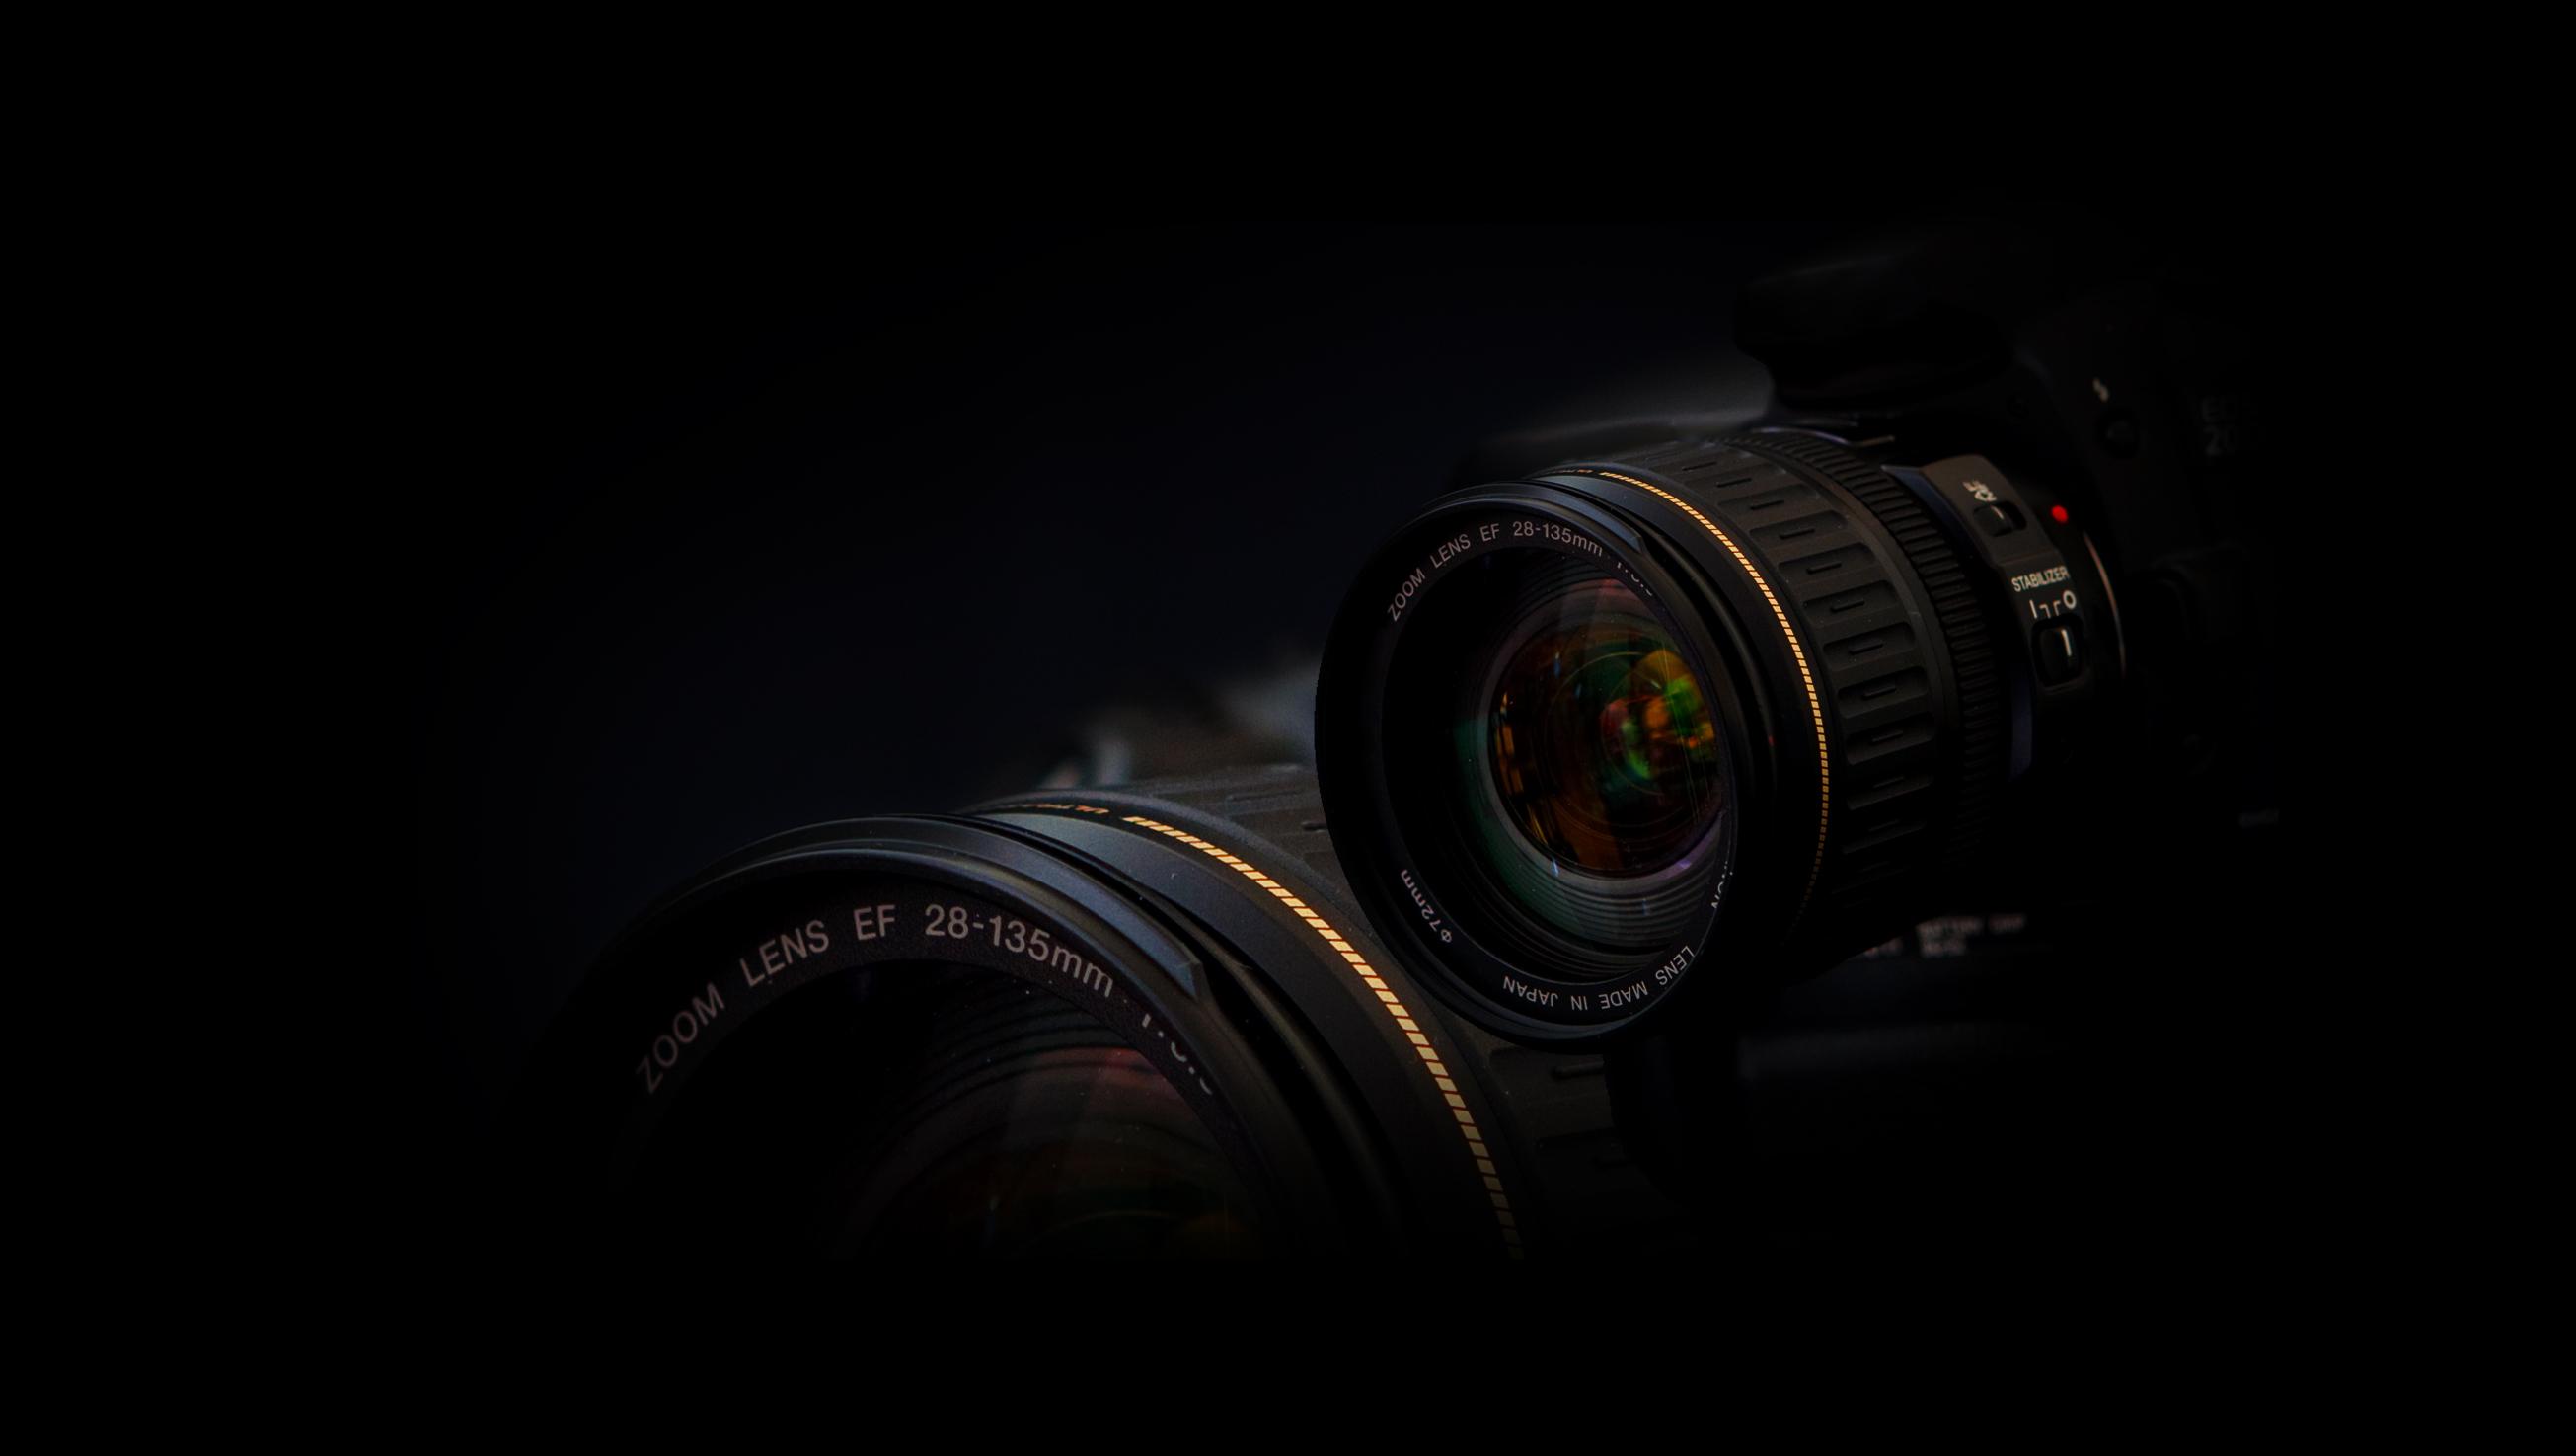 Gear - Digital Best camera dental photography